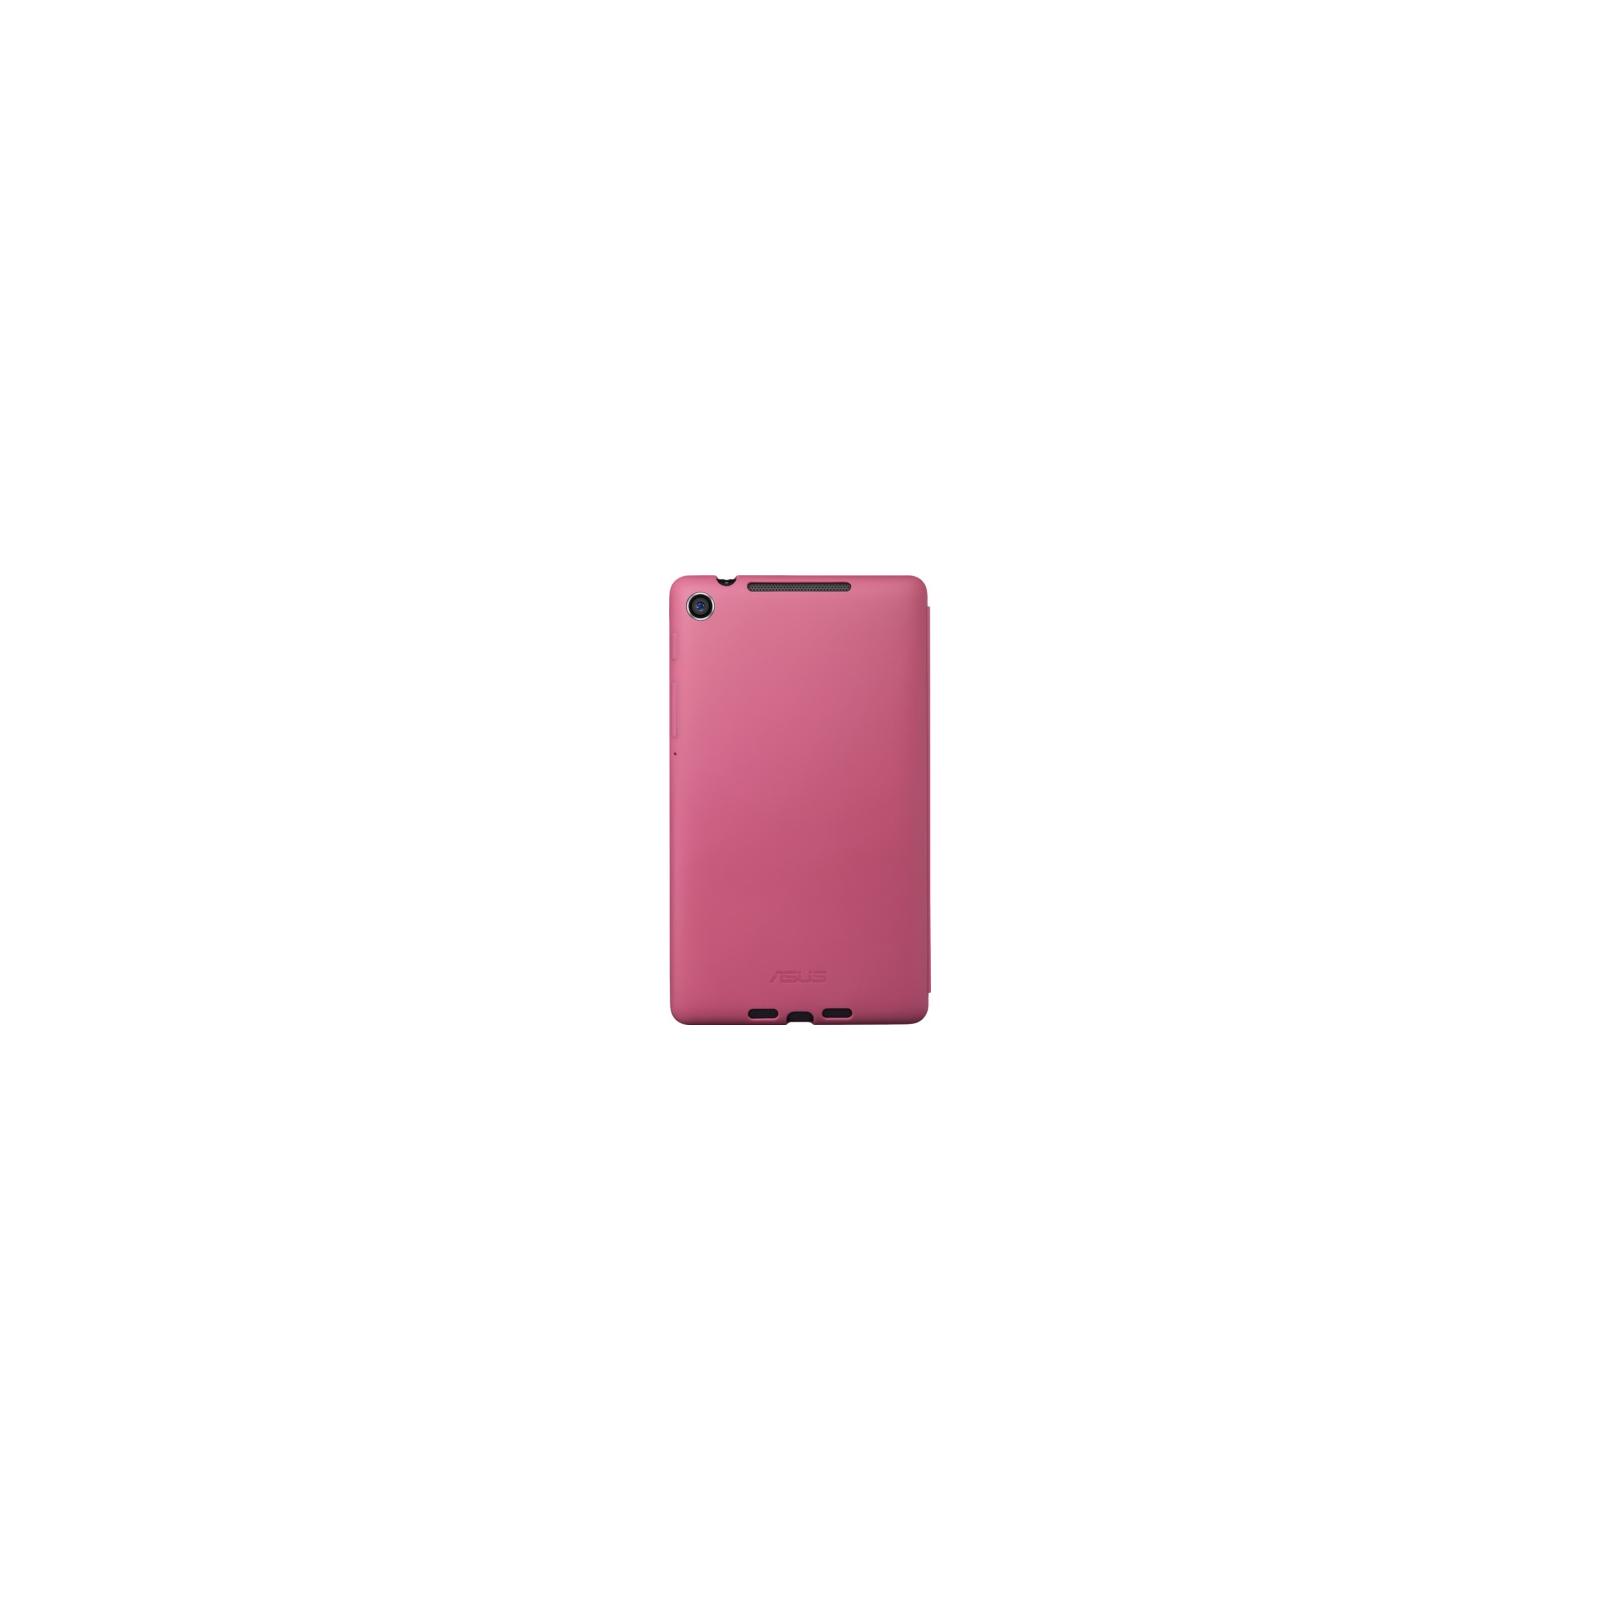 Чехол для планшета ASUS Nexus 7 2013 TRAVEL COVER V2 PINK (90-XB3TOKSL001P0-) изображение 2